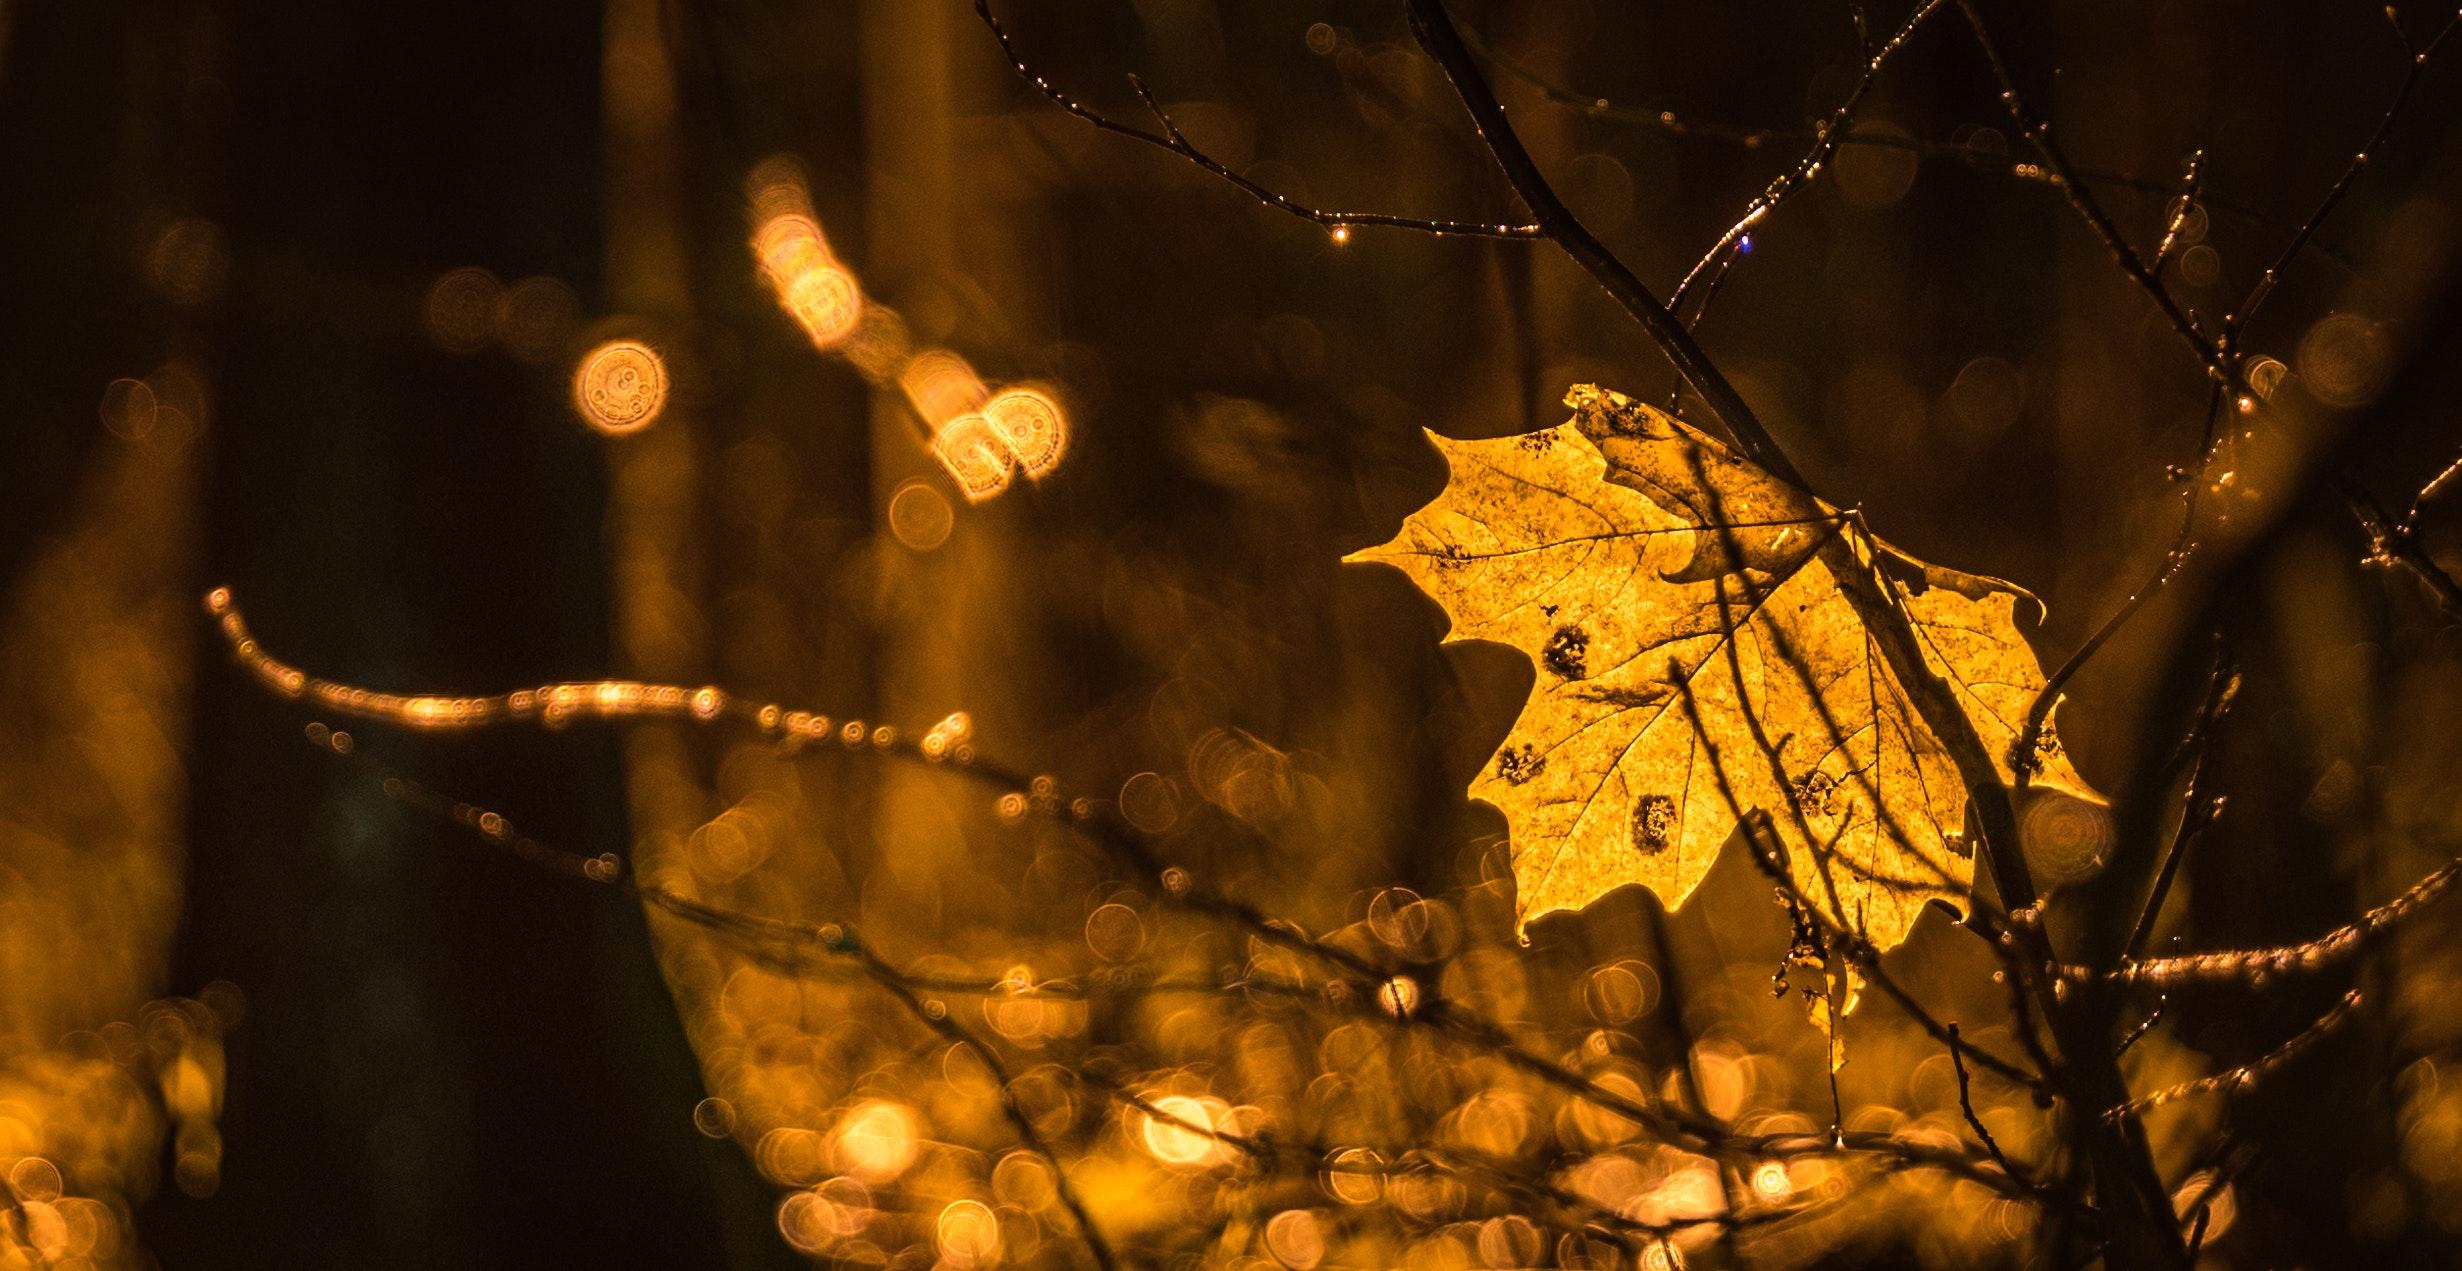 autumn-blurred-background-bokeh-754072.jpg